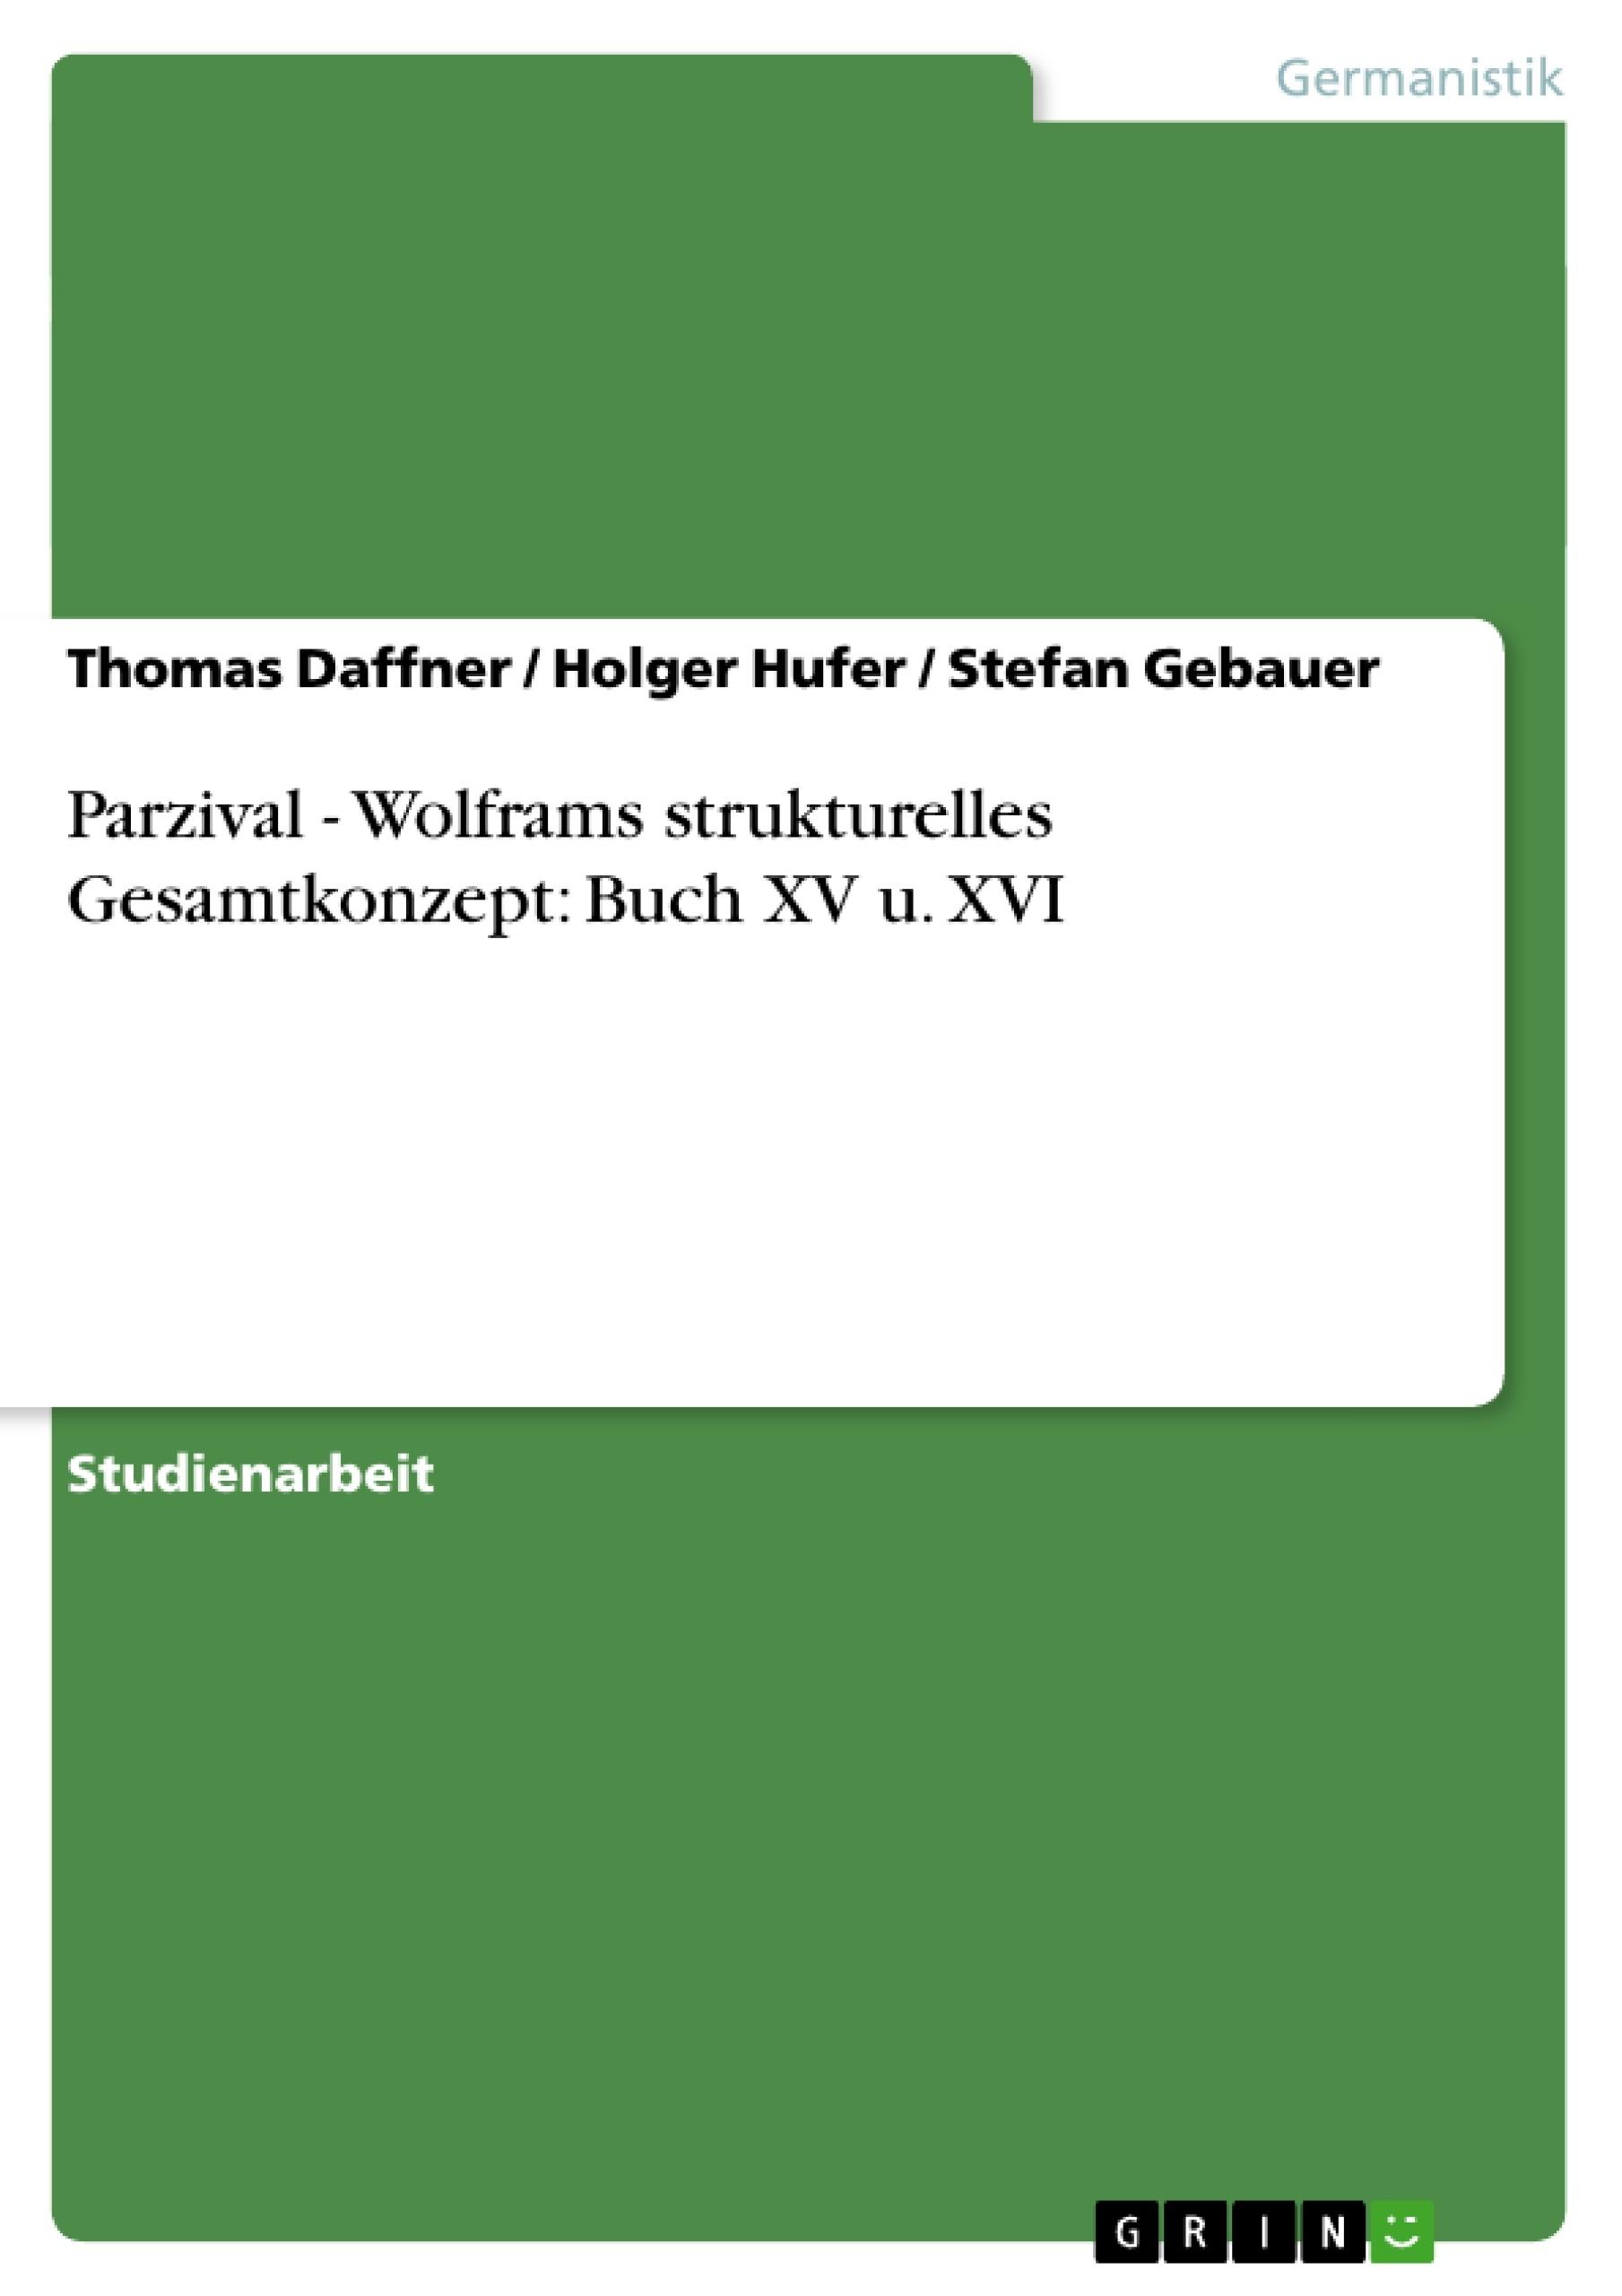 Titel: Parzival - Wolframs strukturelles Gesamtkonzept: Buch XV u. XVI